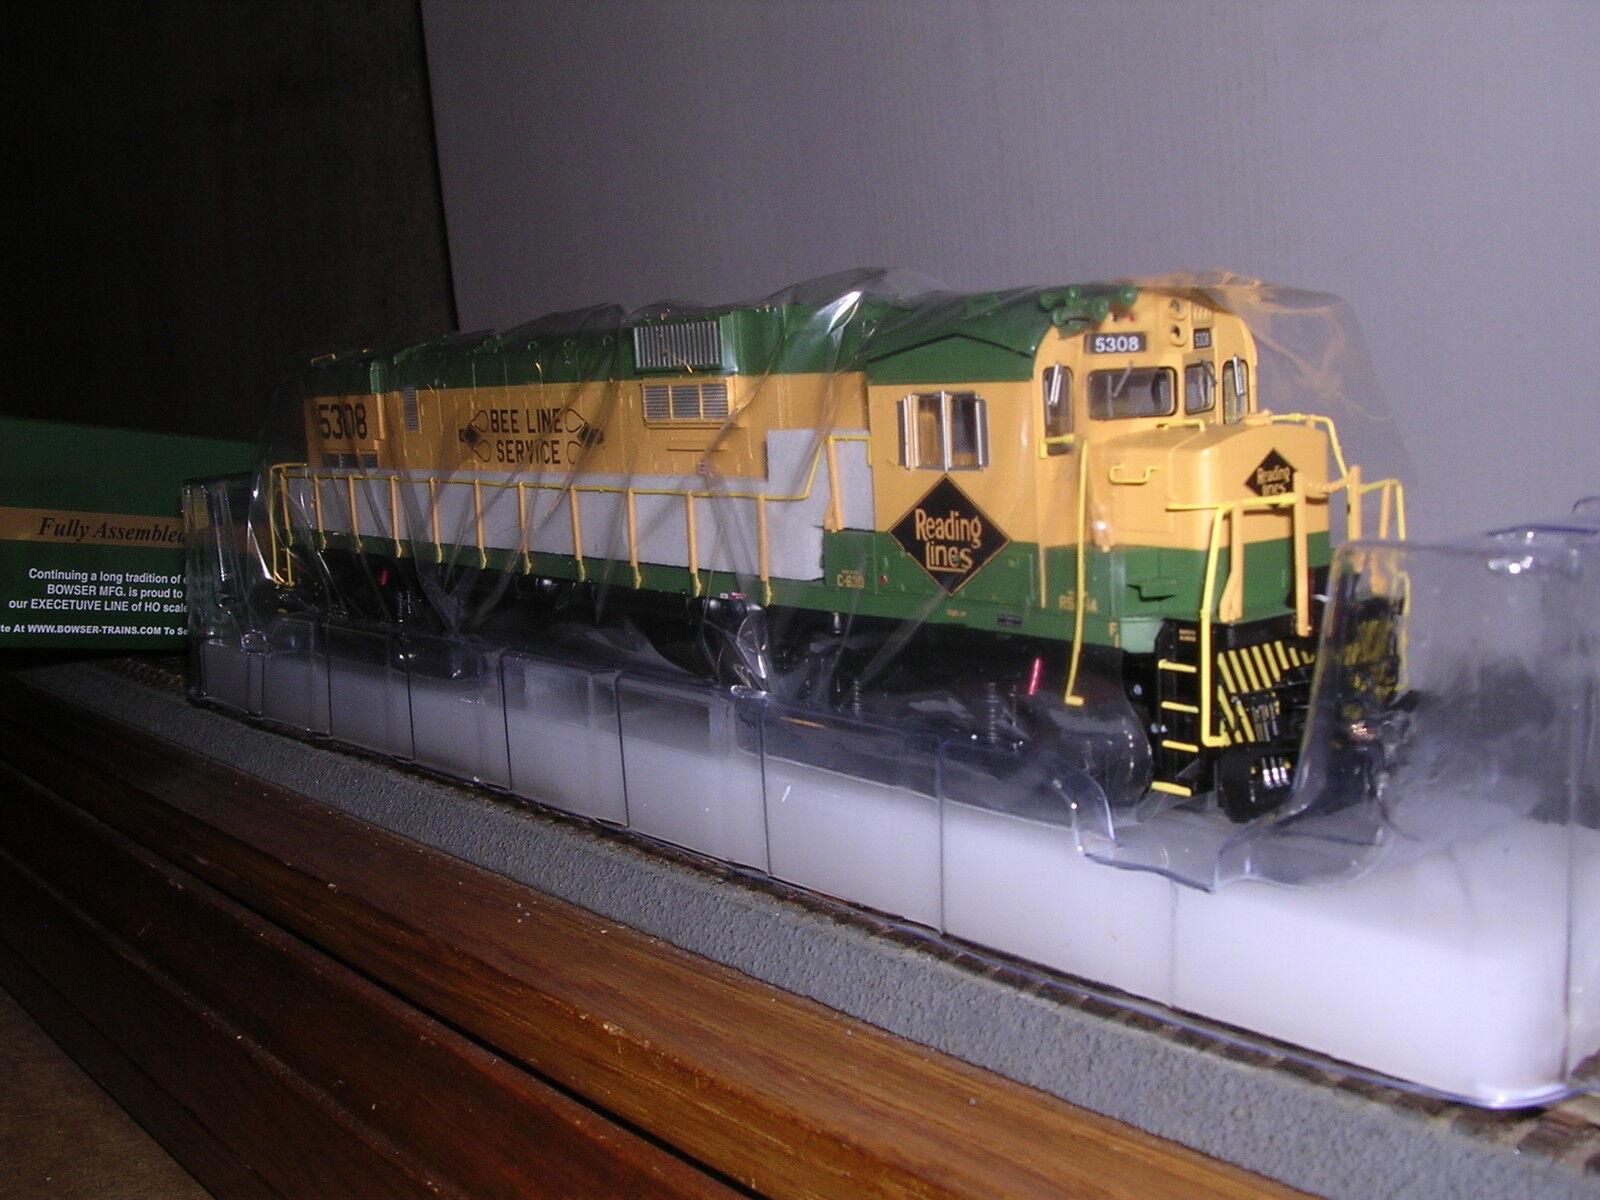 BOWSER  23678 Reading C-630 Diesel Loco  5311  Grün & Gelb  w DCC & Sound1 87